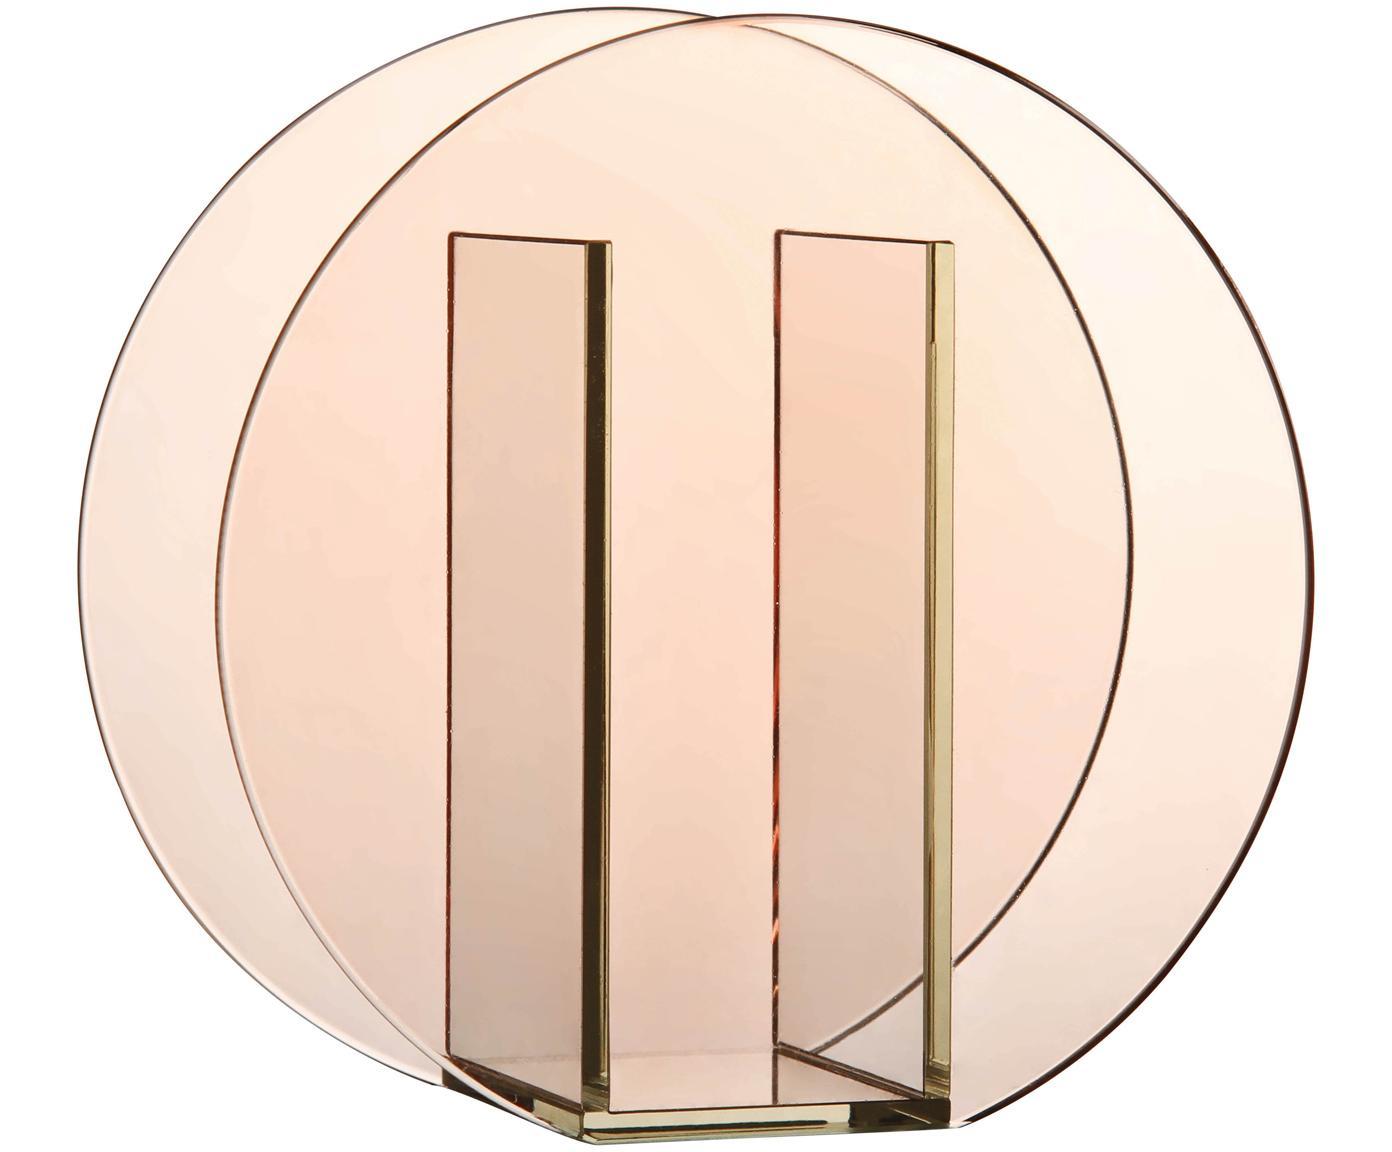 Glas-Vase Transparence, Glas, Rosa, 17 x 17 cm